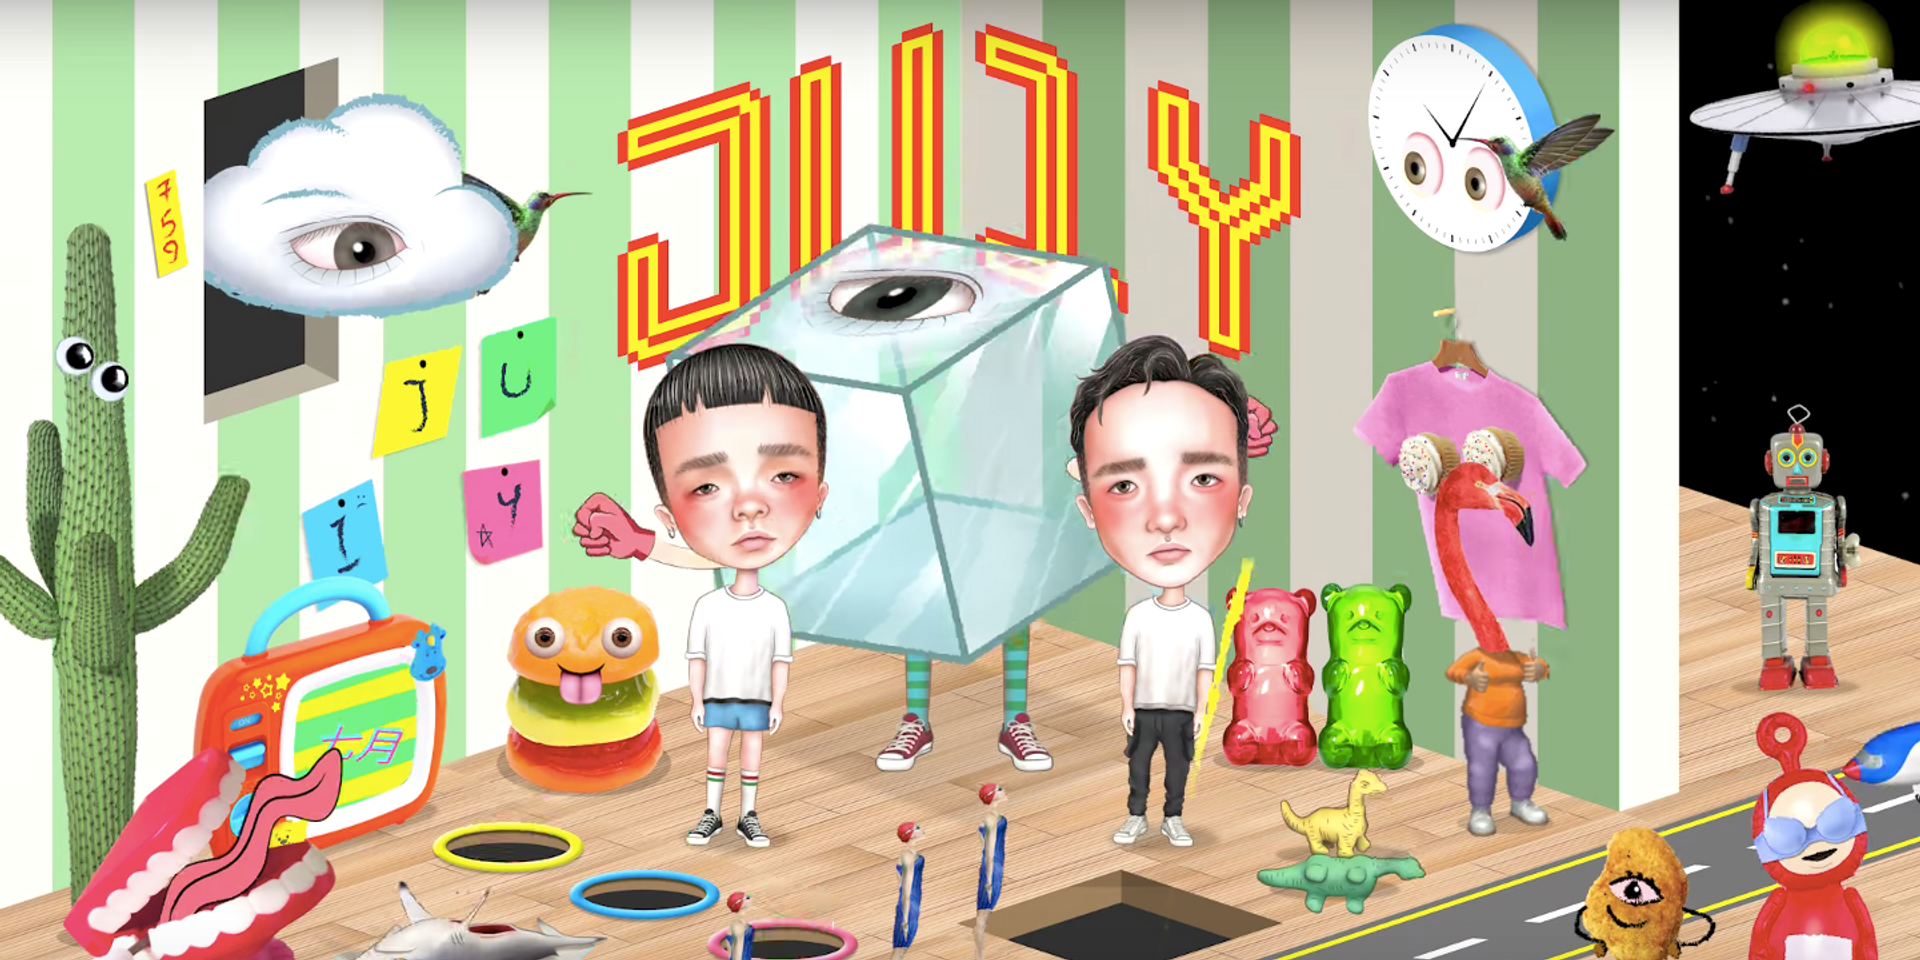 Gentle Bones & MYRNE unveil music video for 'JU1Y' — watch